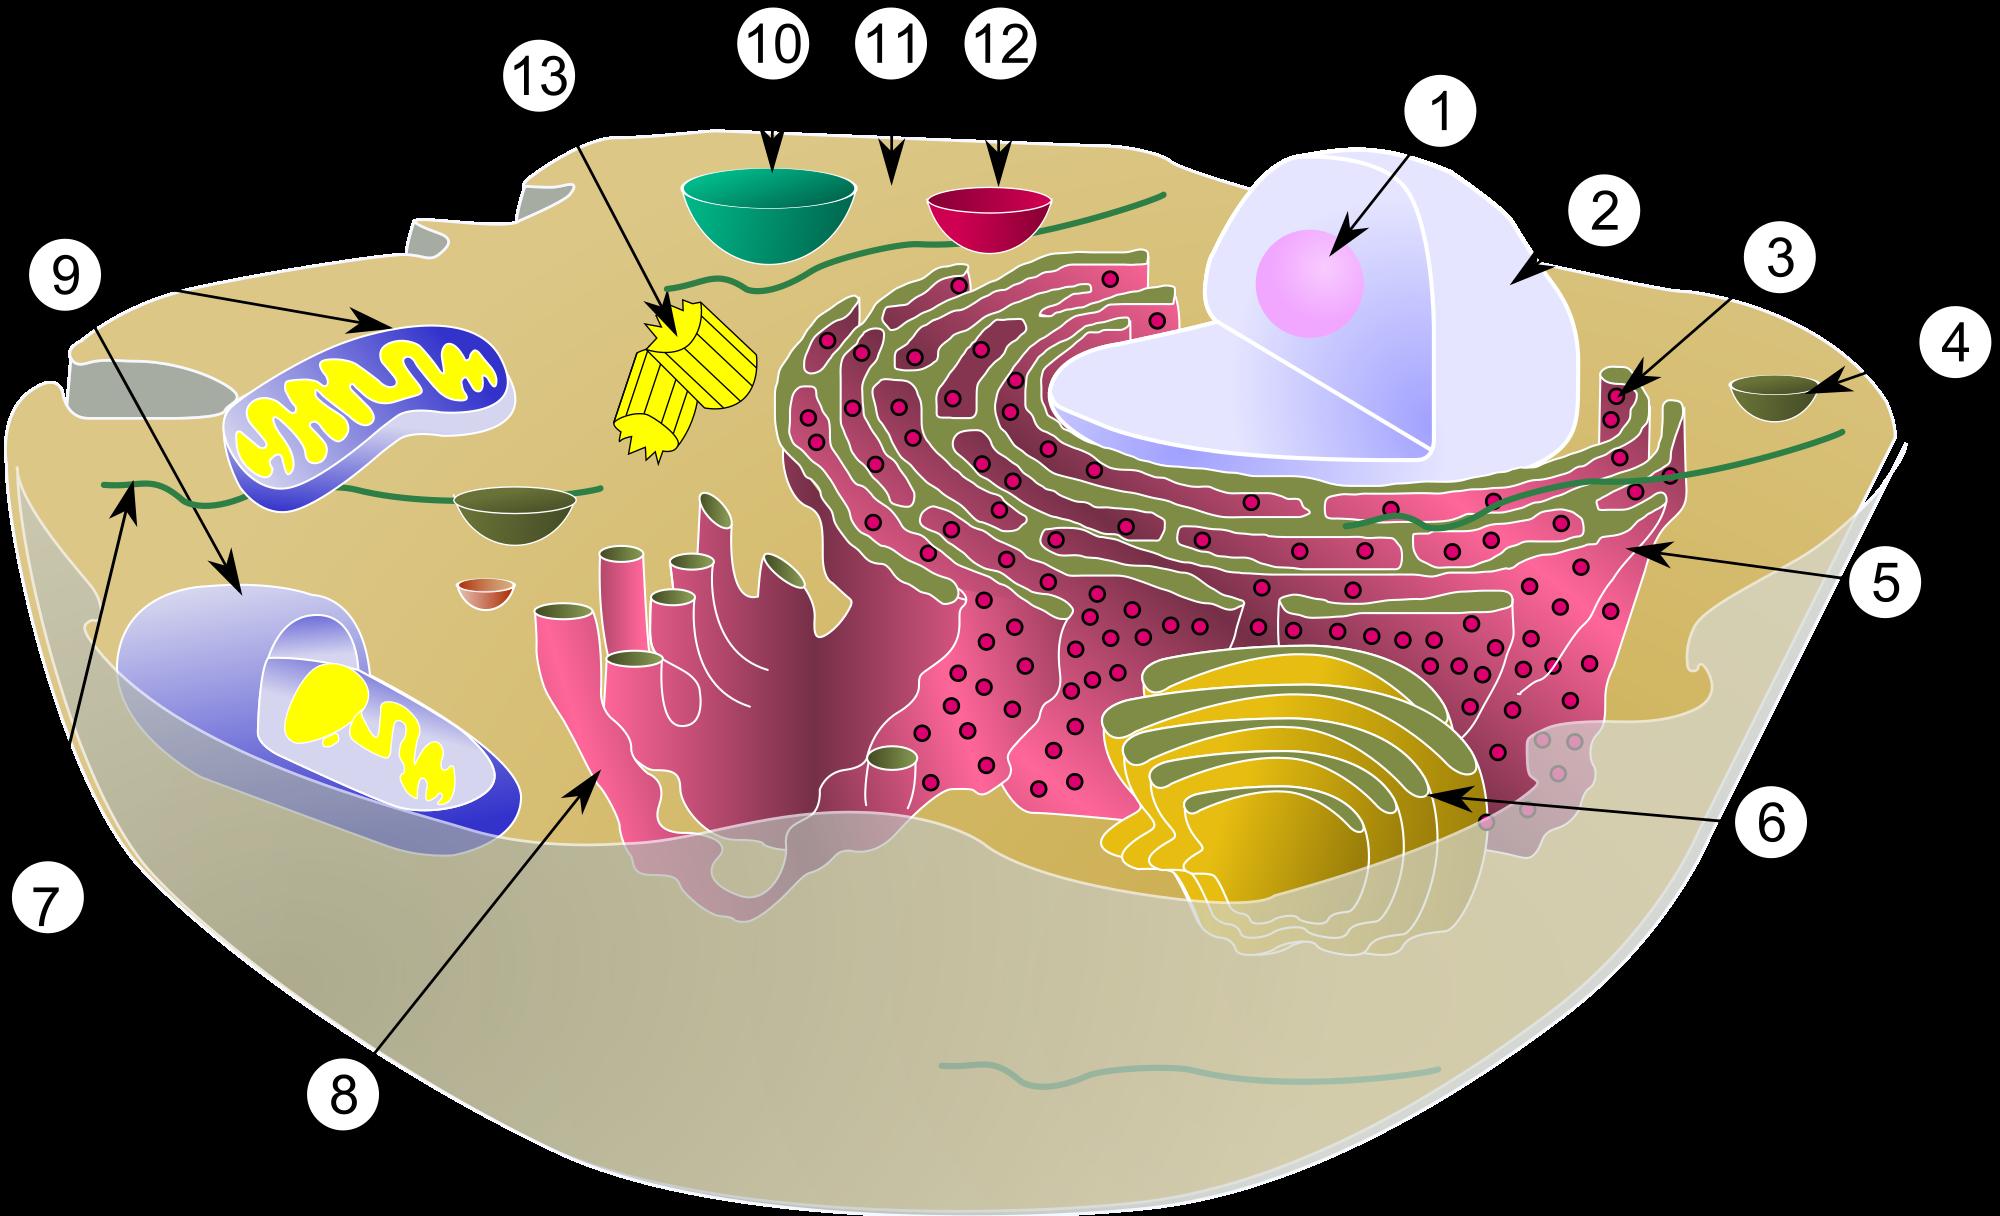 Biology wikipedia color diagram. Idea clipart research paper